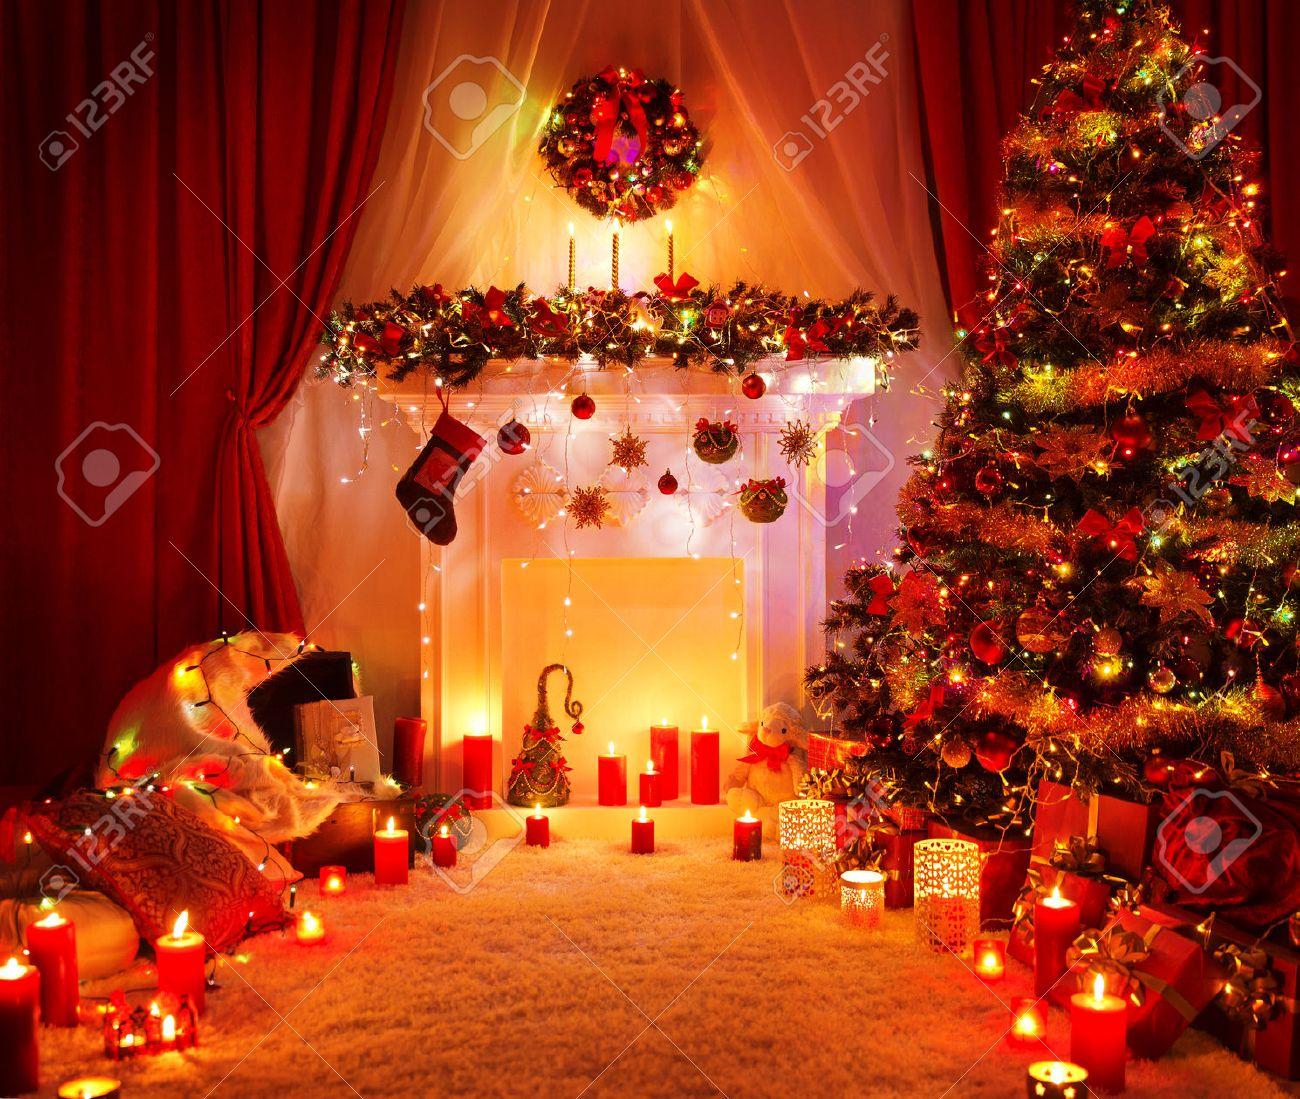 Xmas Deko Weihnachtsbaum.Stock Photo